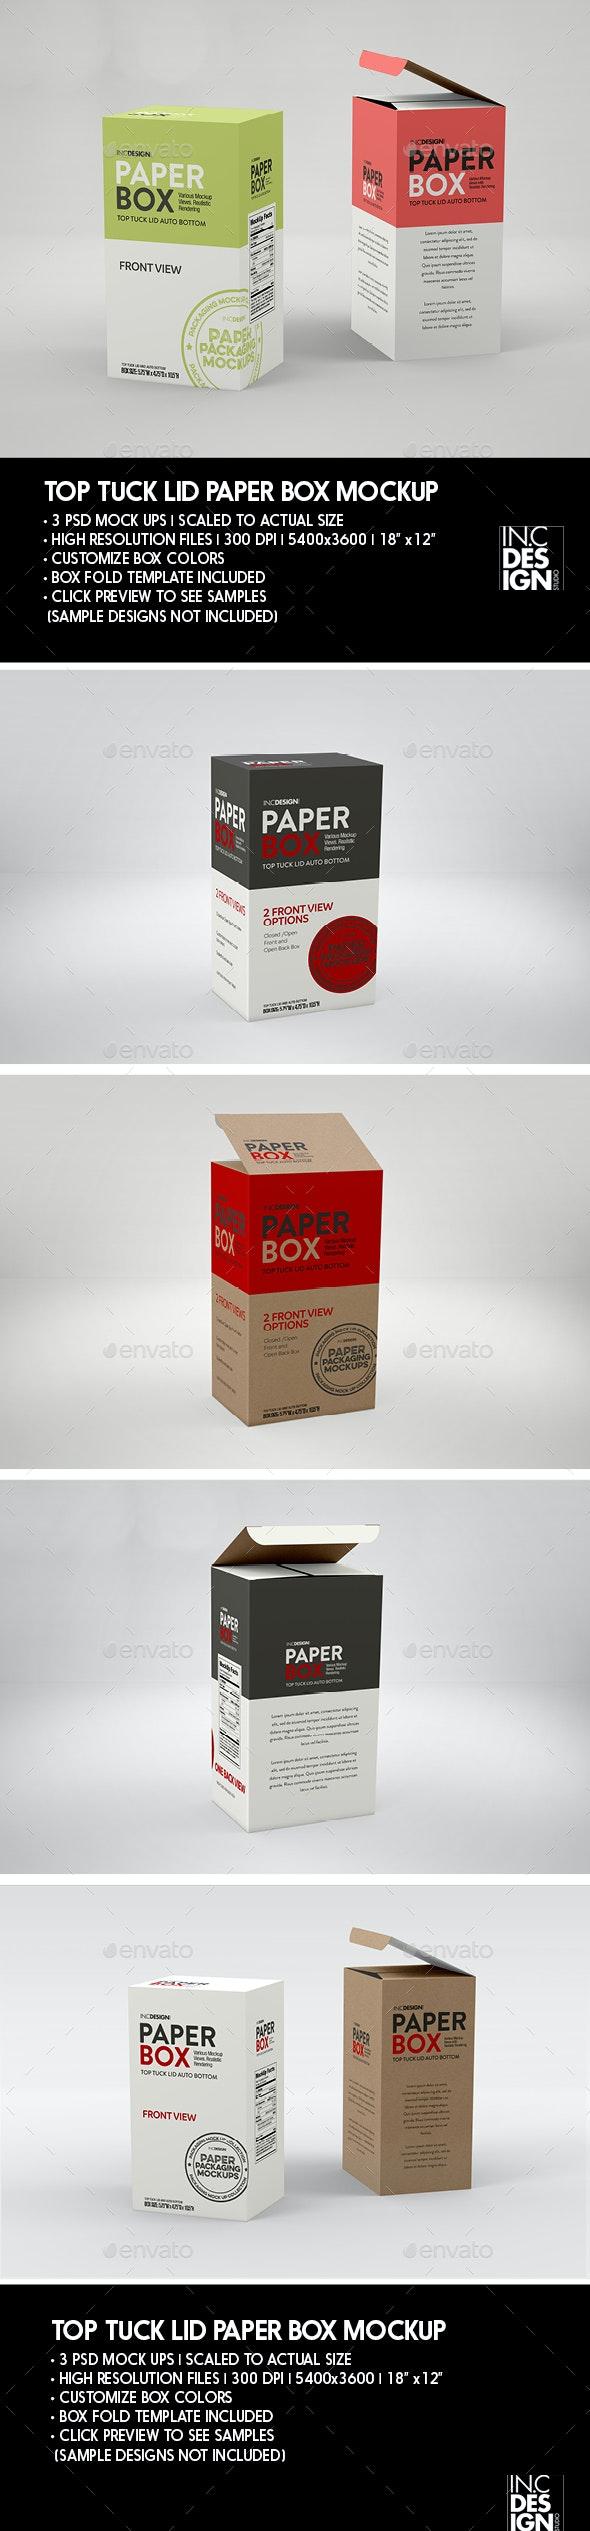 Paper Top Lid Tuck Box Packaging Mockup - Packaging Product Mock-Ups